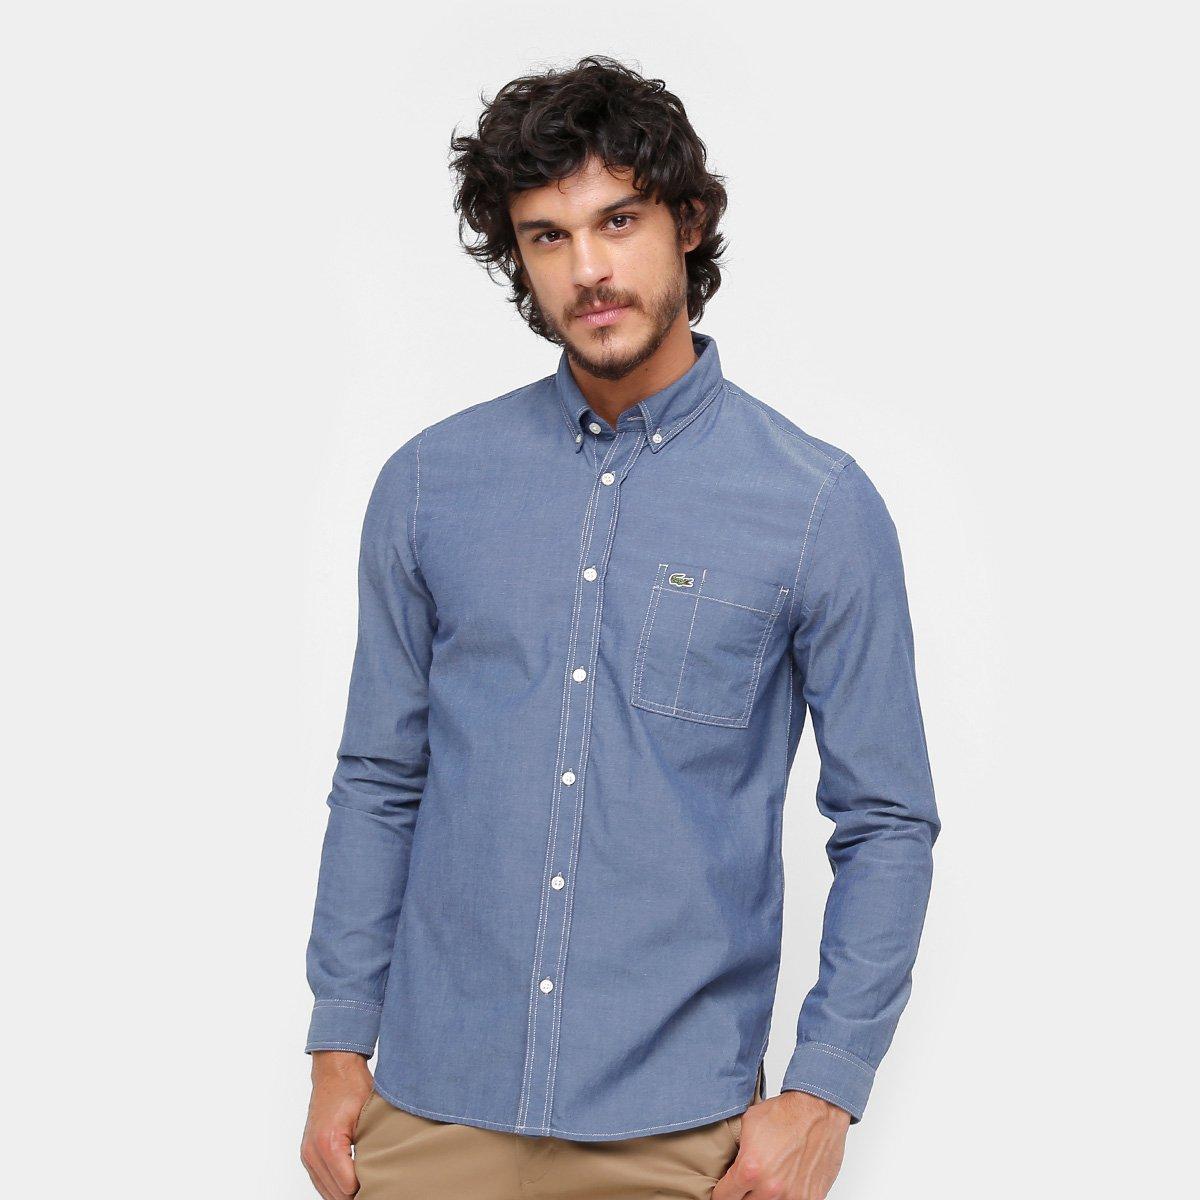 357127a77c Camisa Jeans Lacoste Regular Fit Com Bolso Masculina - Compre Agora ...